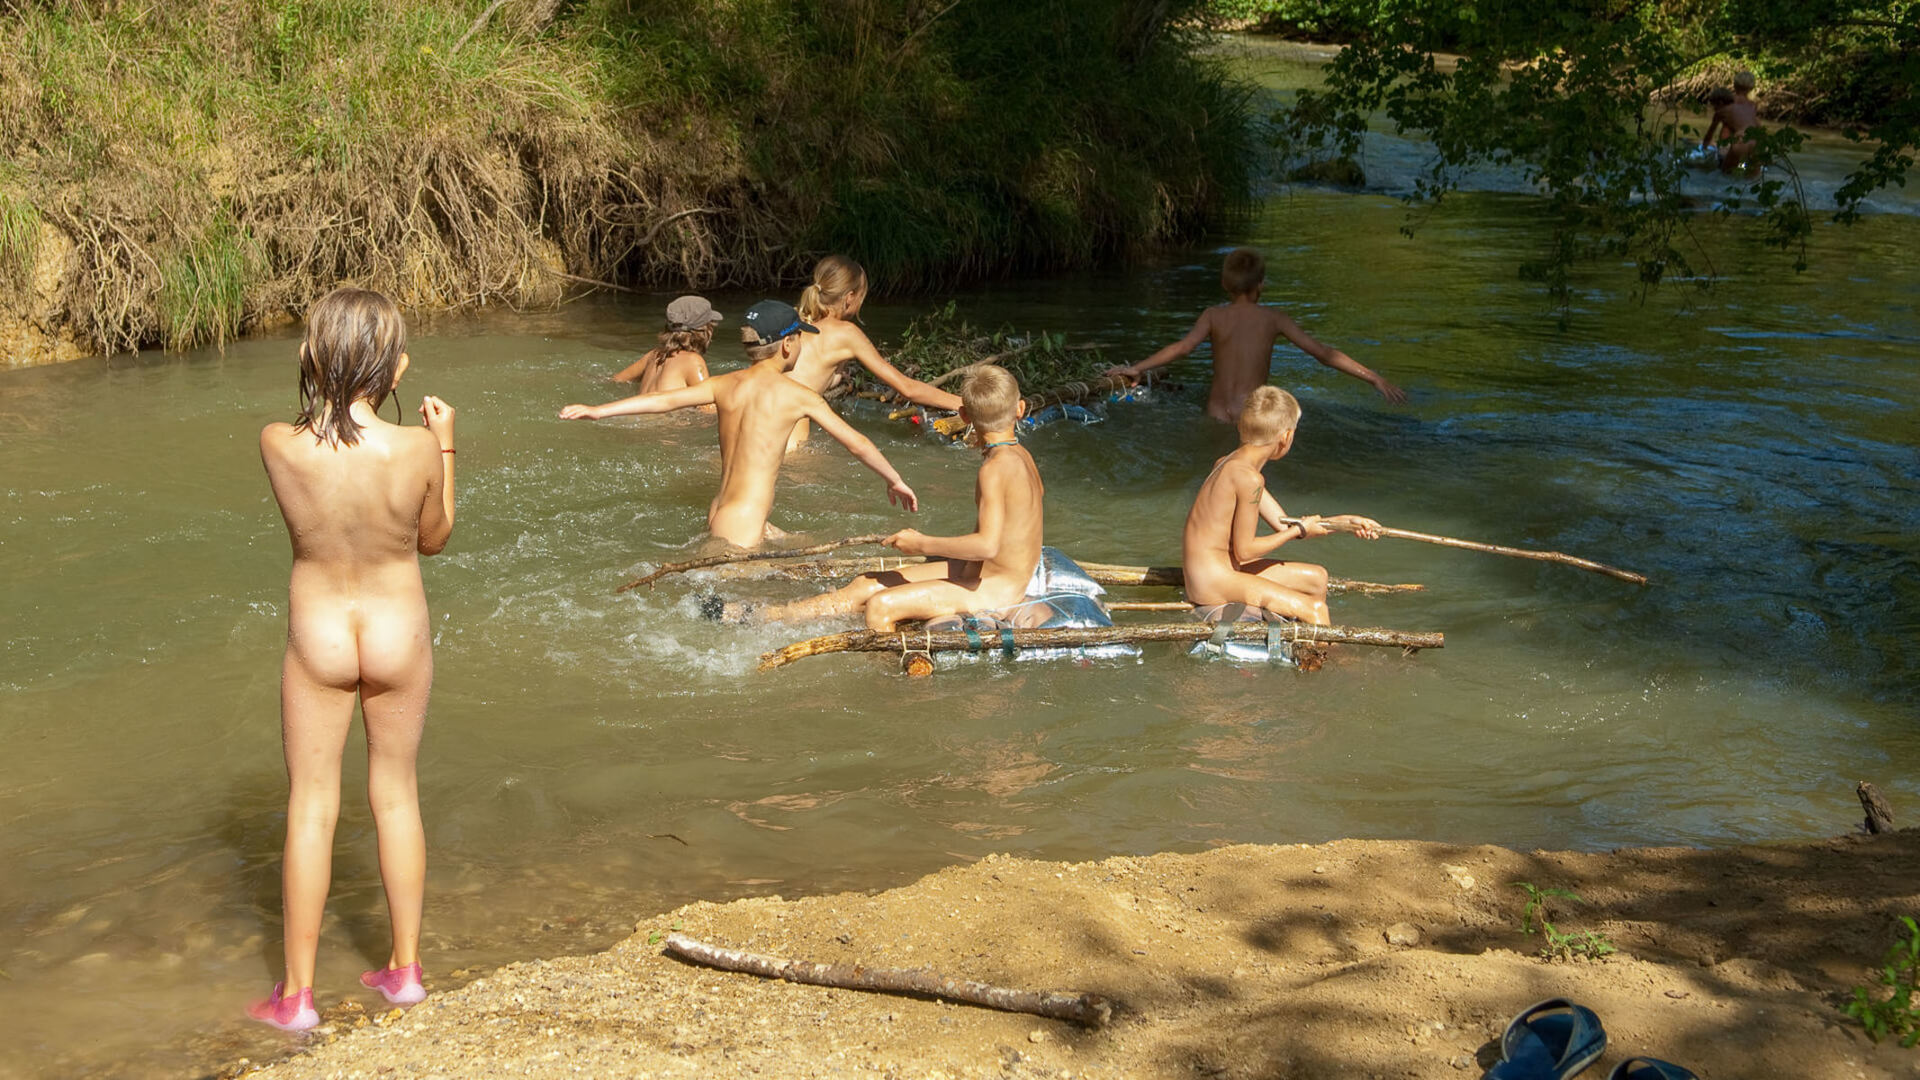 naturistencamping met rivier